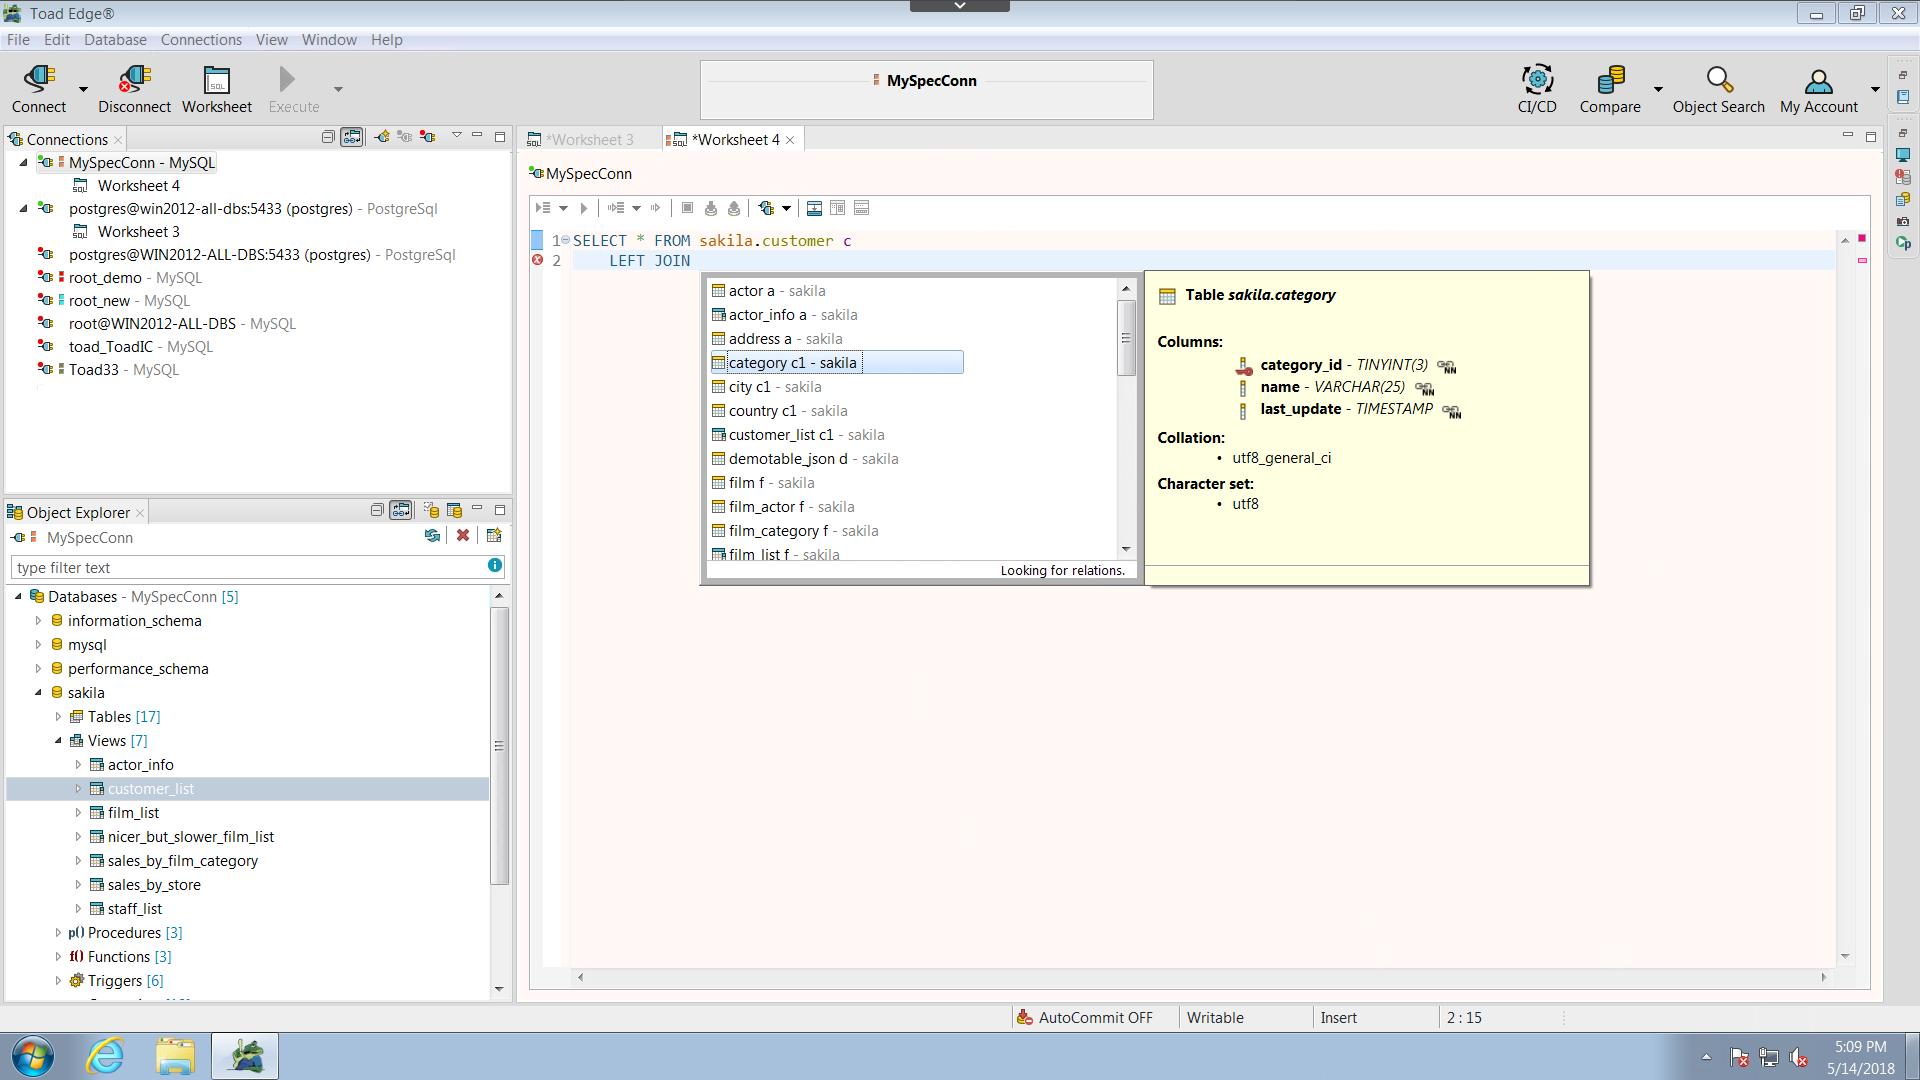 Mysql Database Admin Toad Edge For Mysql